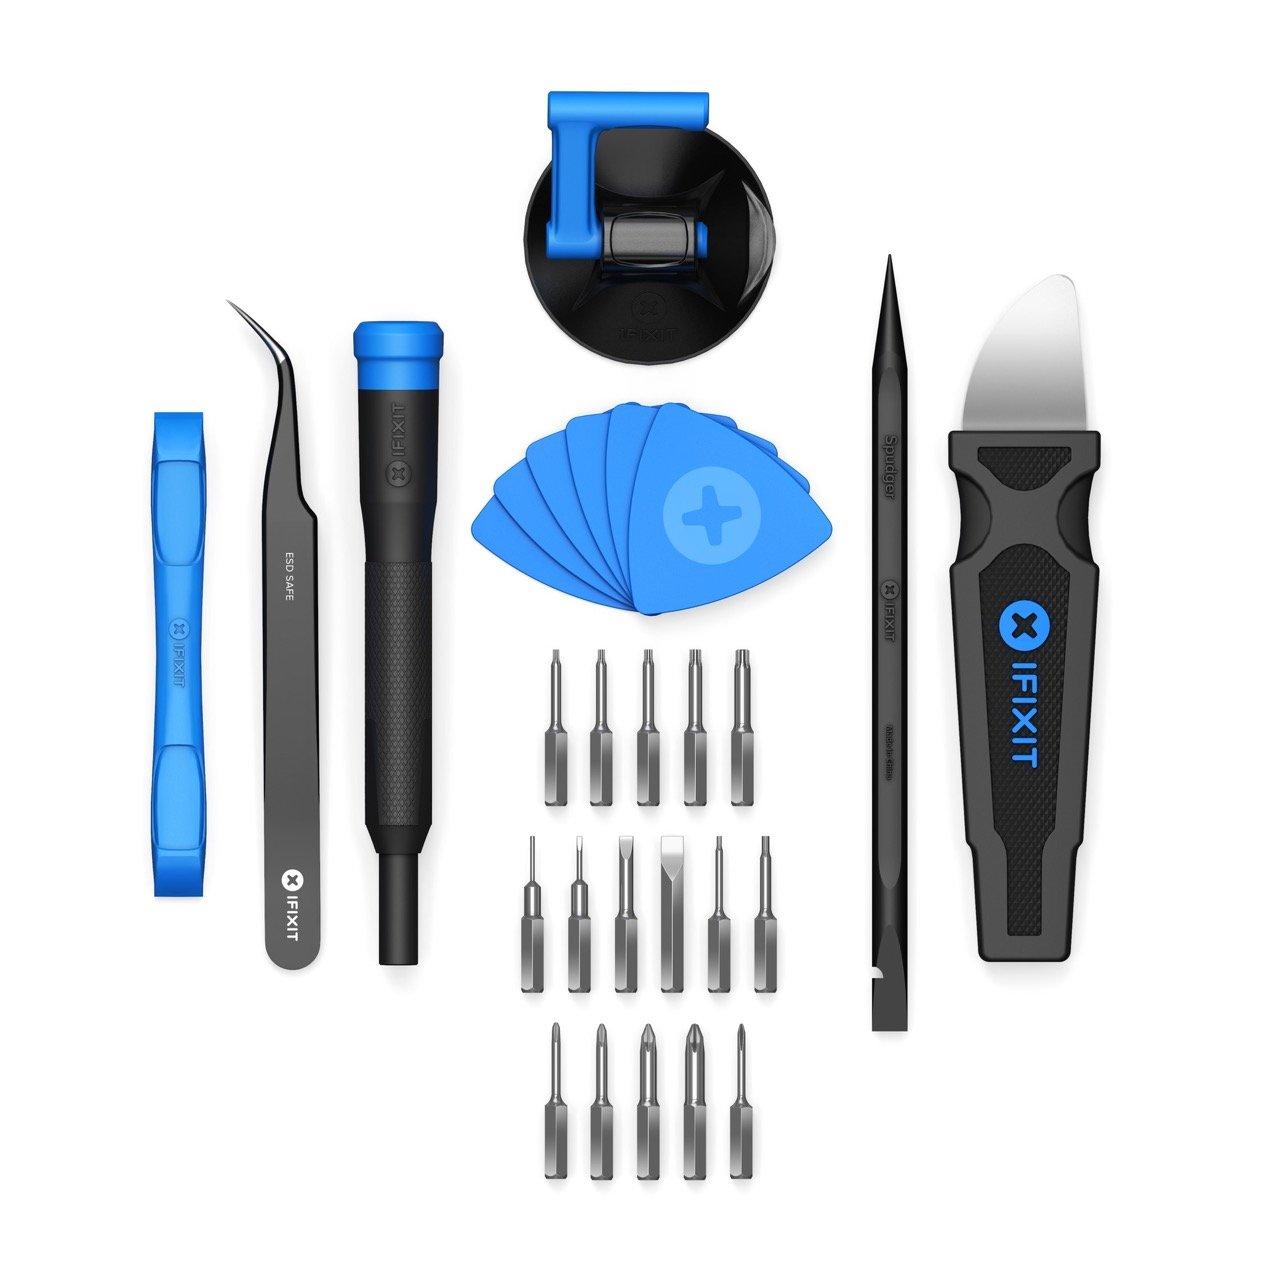 Ifixit Set De Herramientas - Diy Home And Electronics Tools